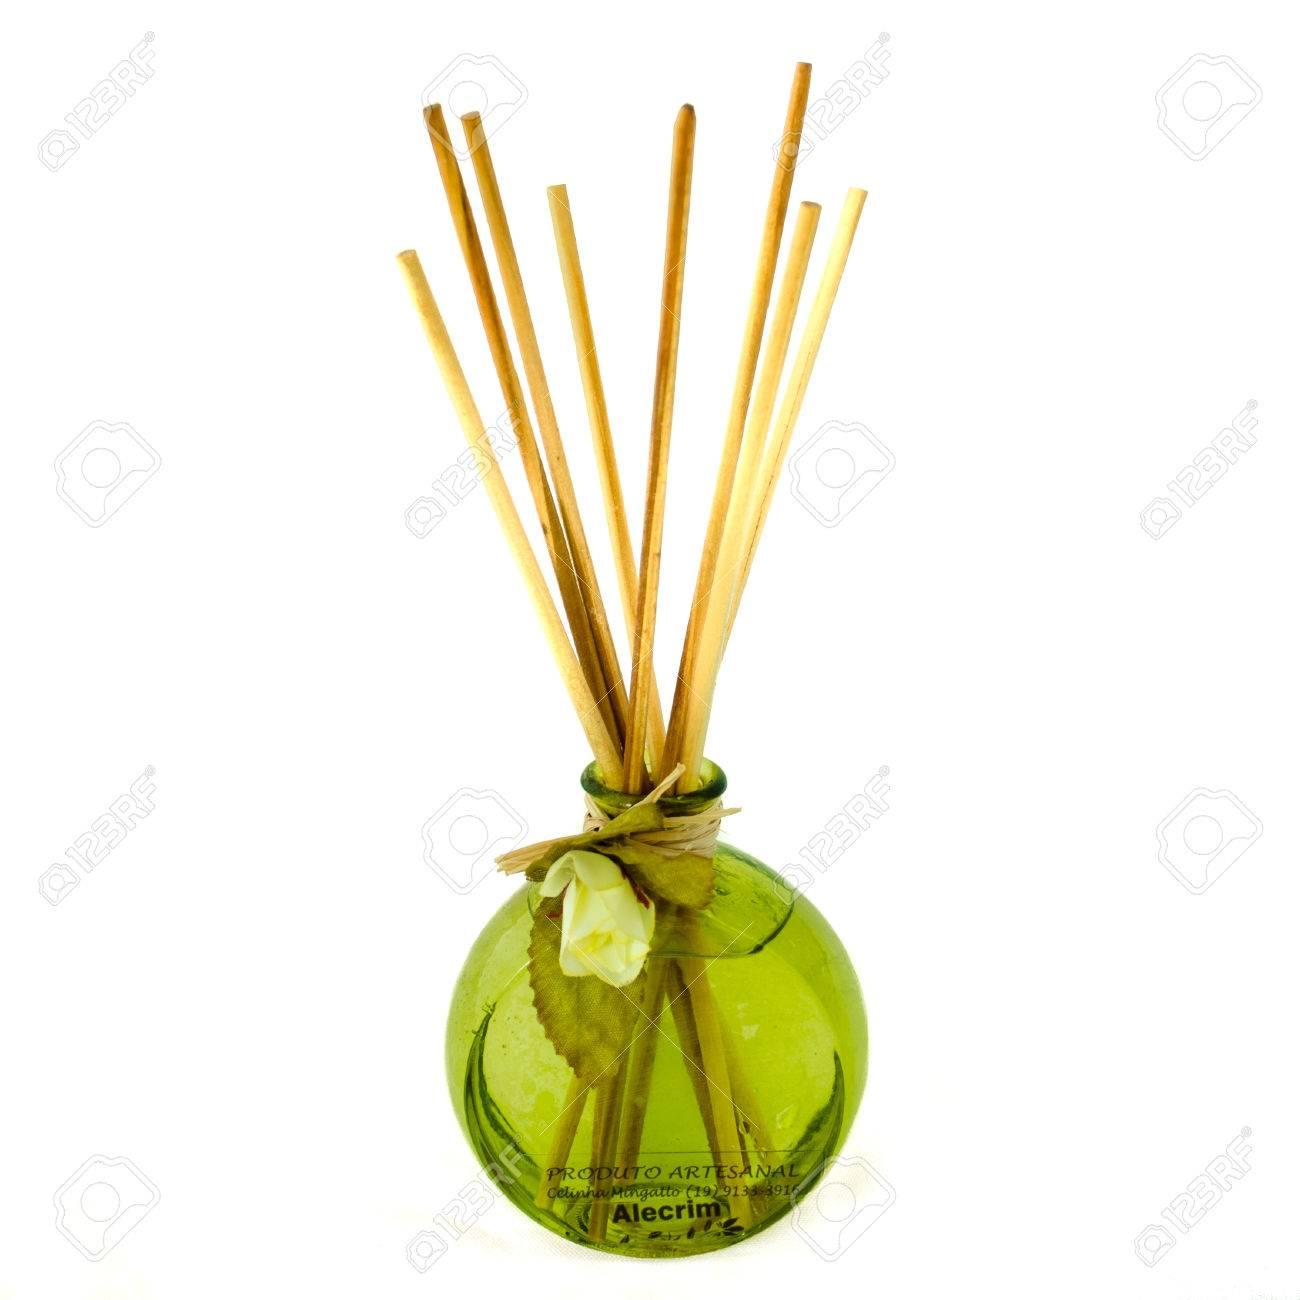 house fragrance scent diffuser stock photo - Scent Diffuser